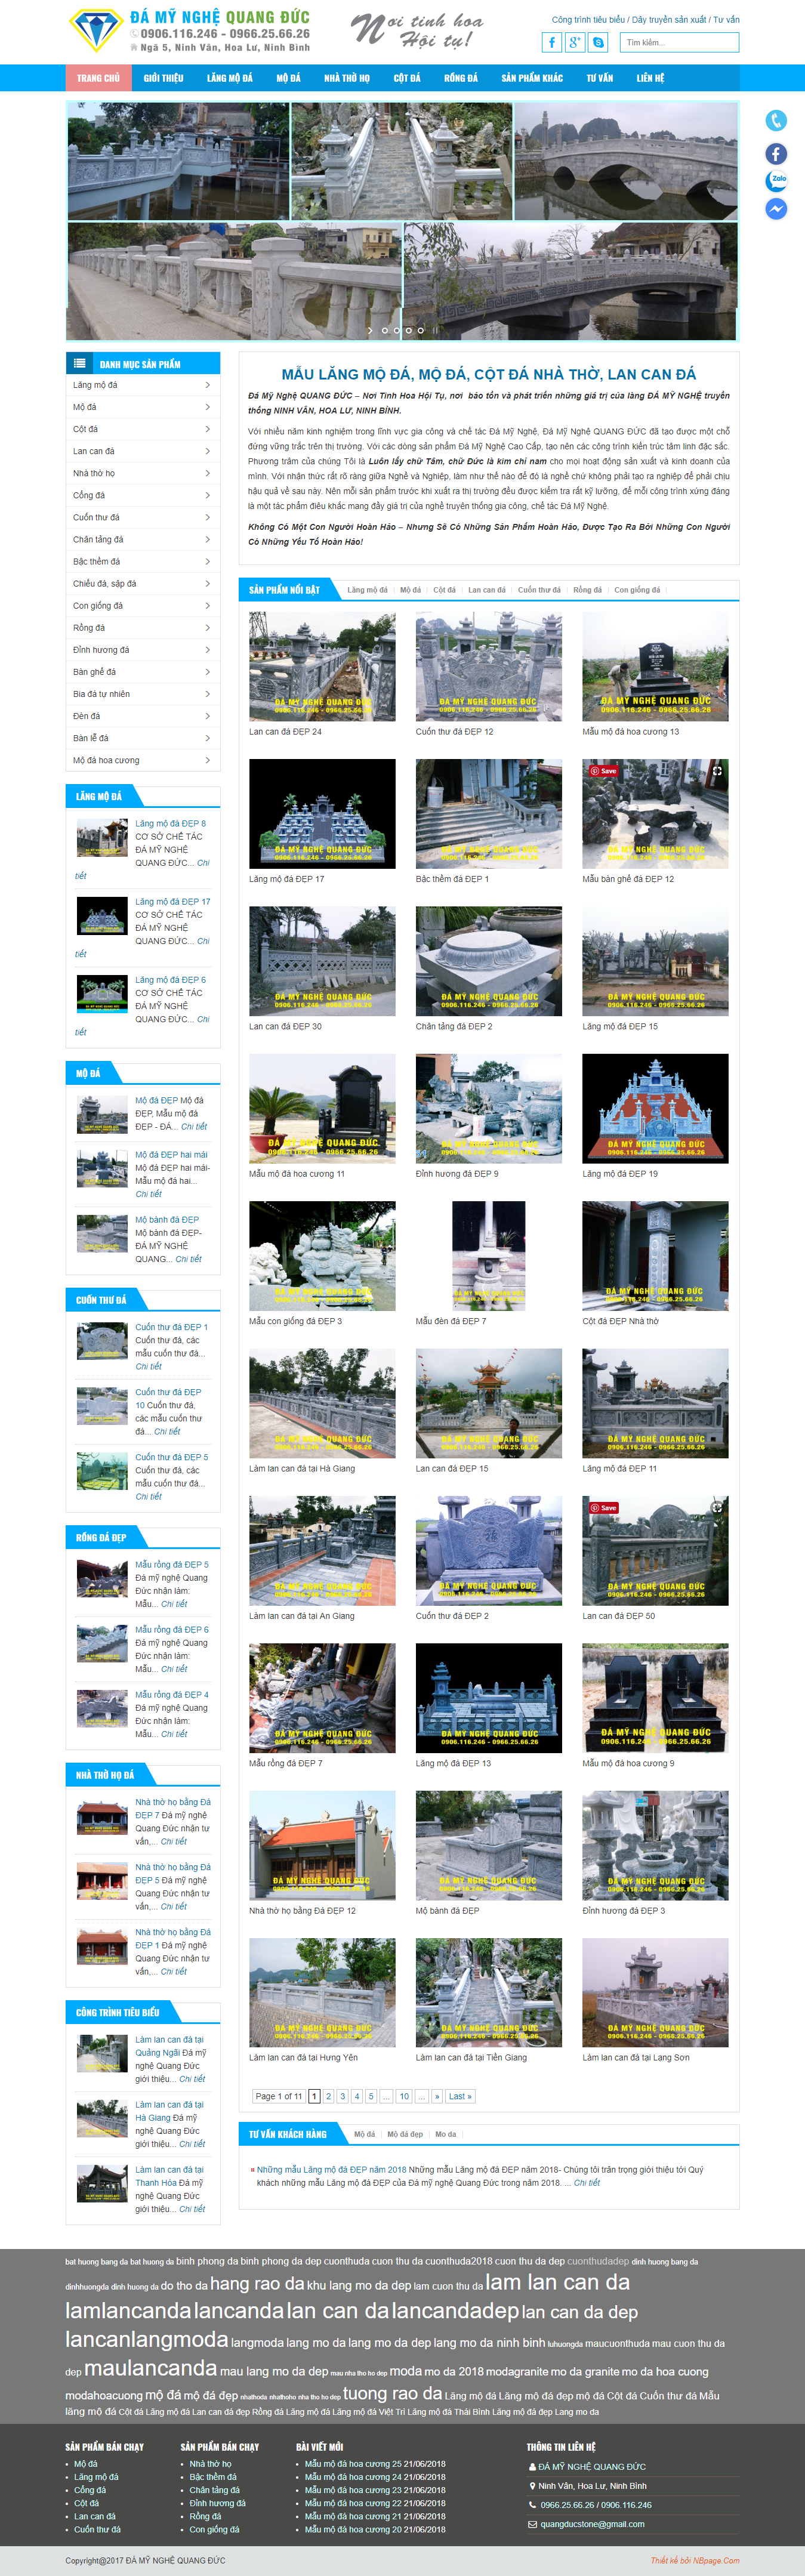 Thiet ke Website Da my nghe Quang Duc